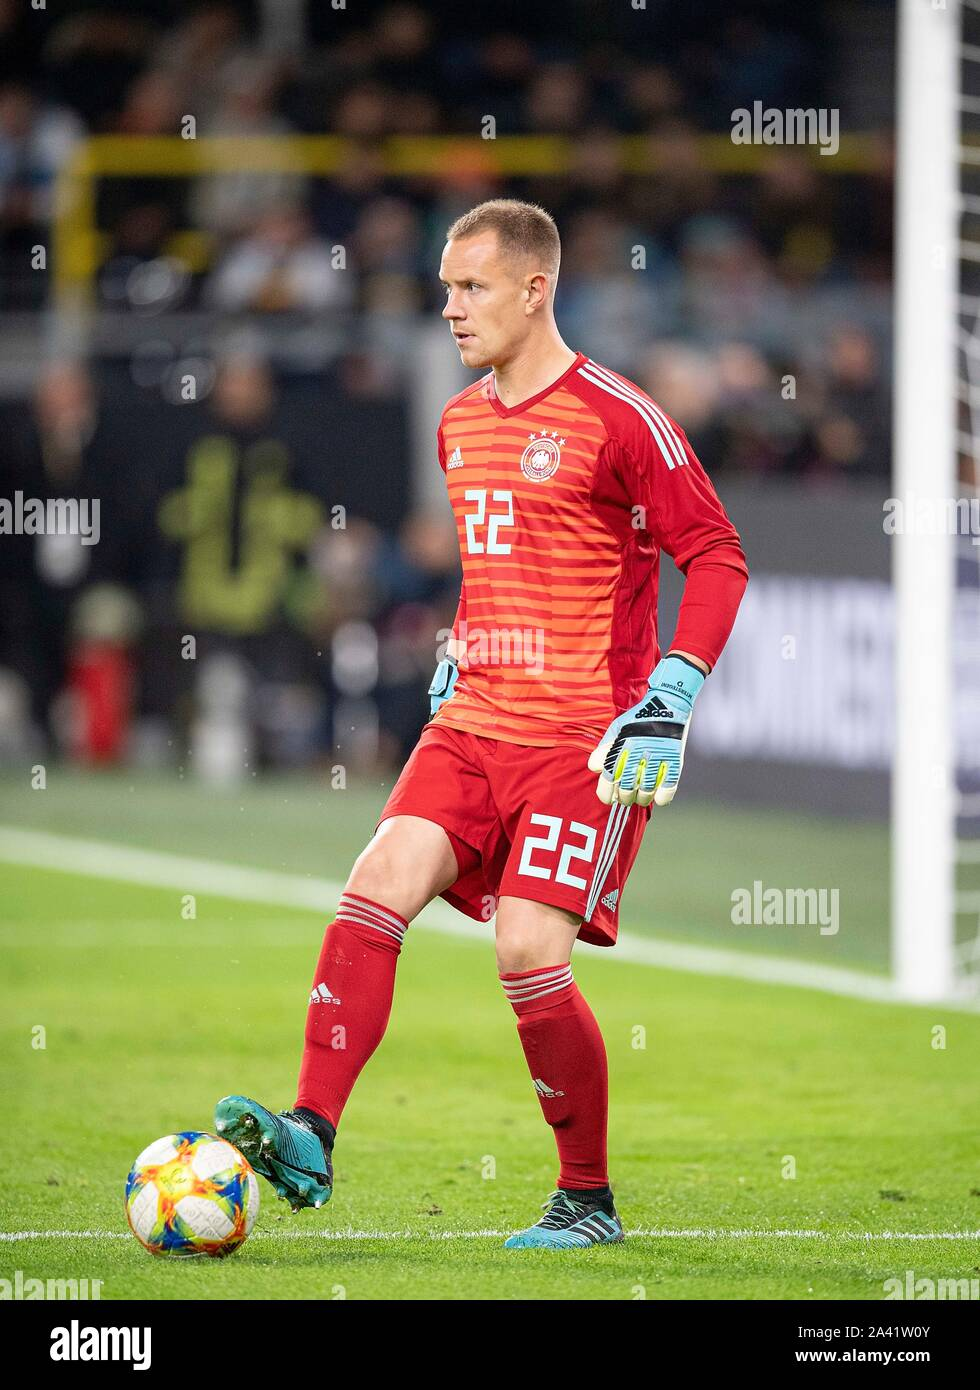 Goalkeeper Marc-Andre TER STEGEN (GER) Promotion, Football Laenderspiel, Friendly Match, Germany (GER) - Argentina (ARG) 2: 2, on 09/10/2019 in Dortmund/Germany. ¬ | usage worldwide Stock Photo